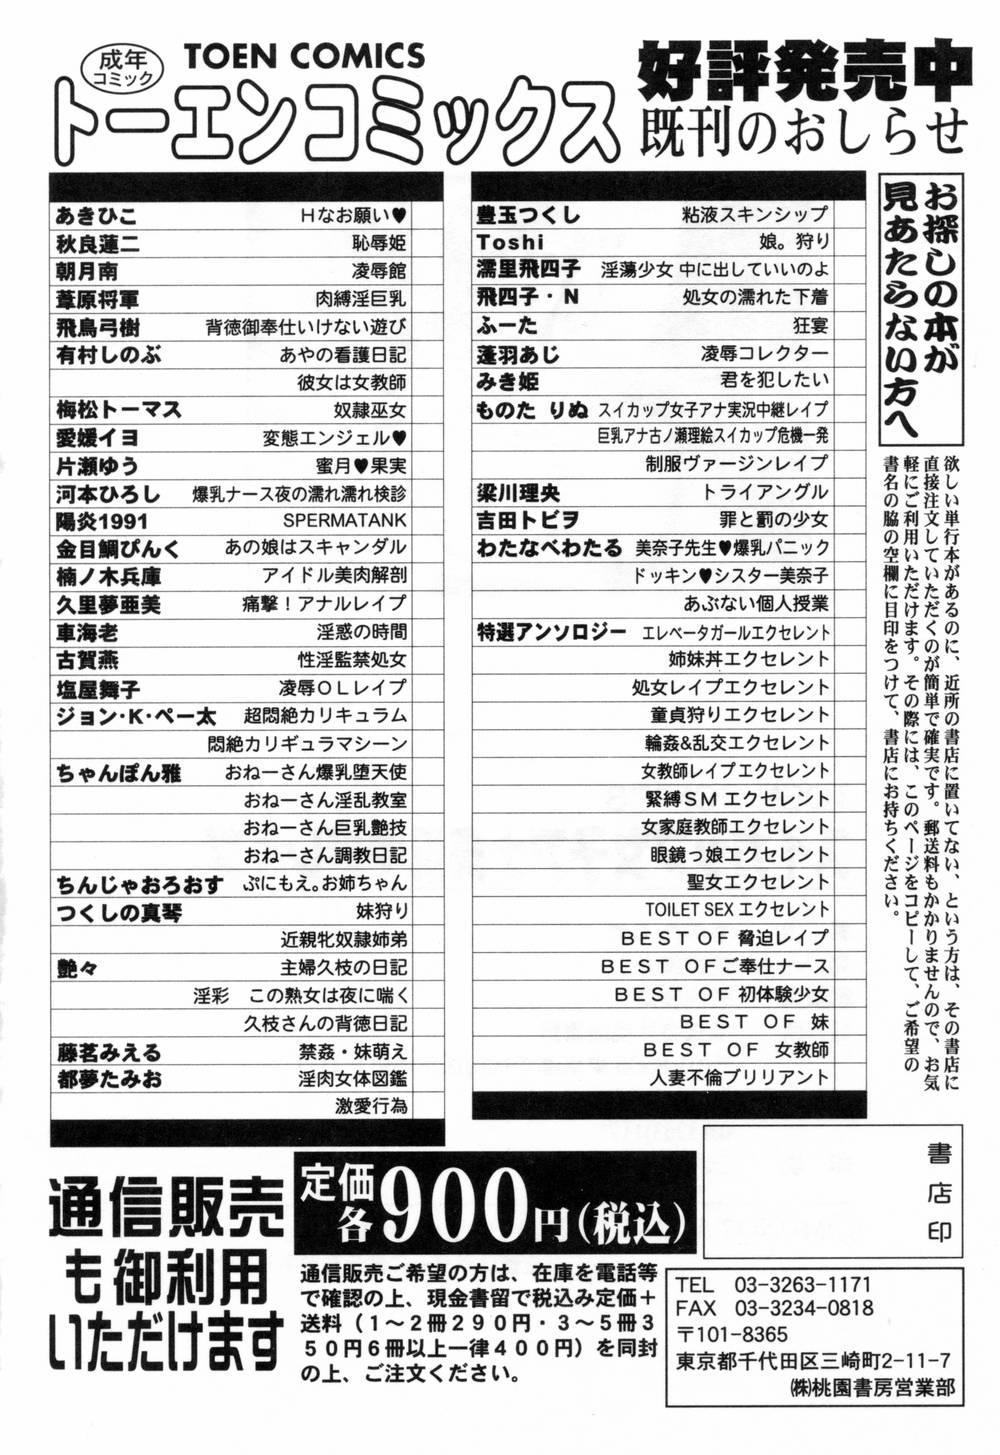 SuiCup Joshi Announcer Jikkyo Chukei Rape 175